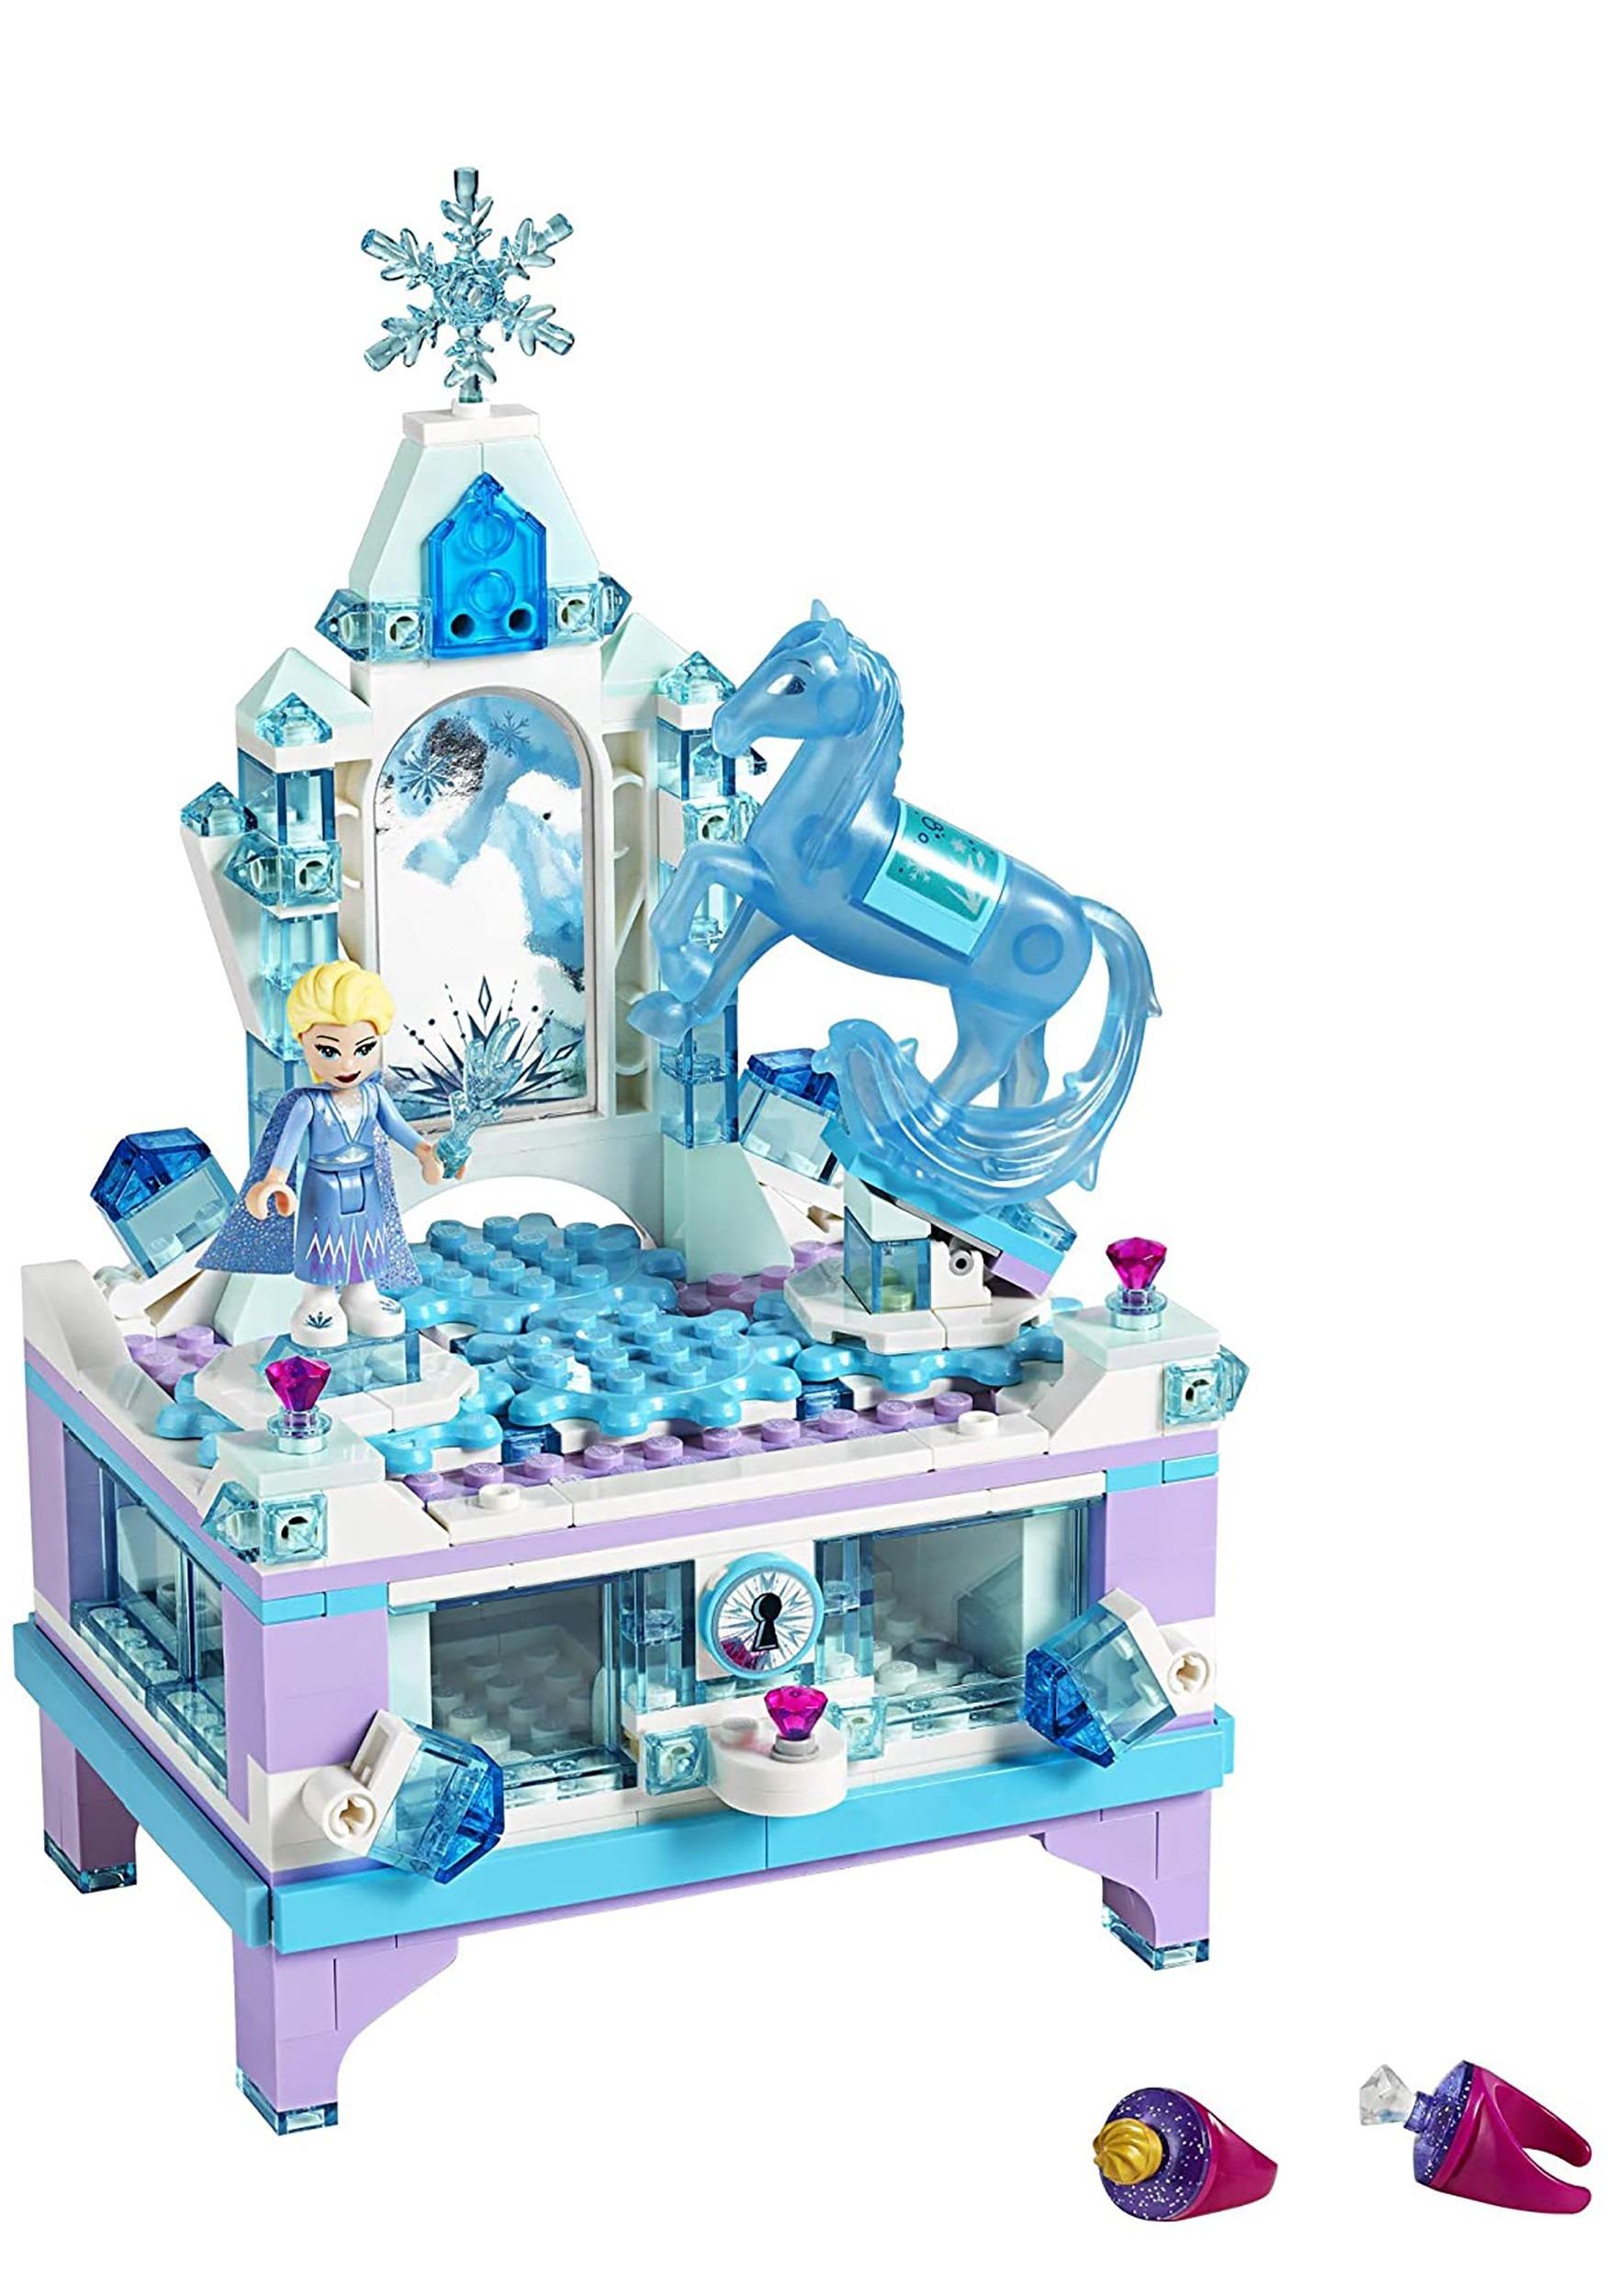 Frozen 2 Lego Elsa S Jewelry Box Creation Building Set